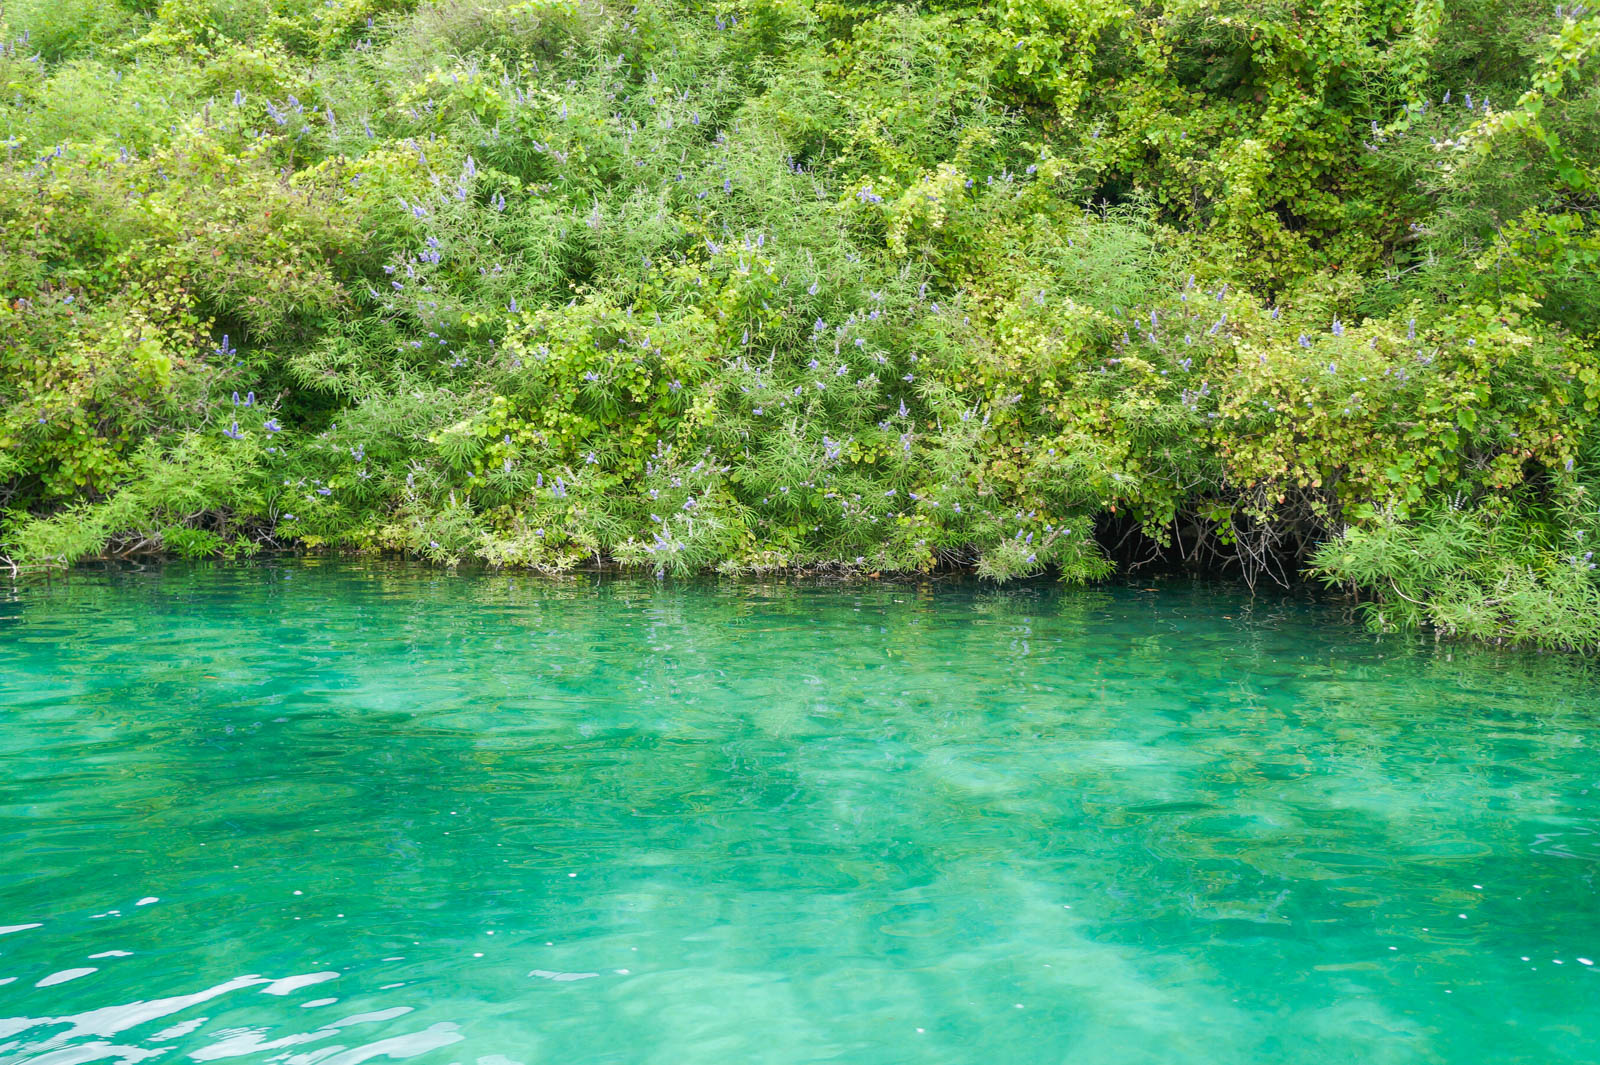 kourna-lake-crete-greece-la-vie-en-blog-all-rights-reserved-3